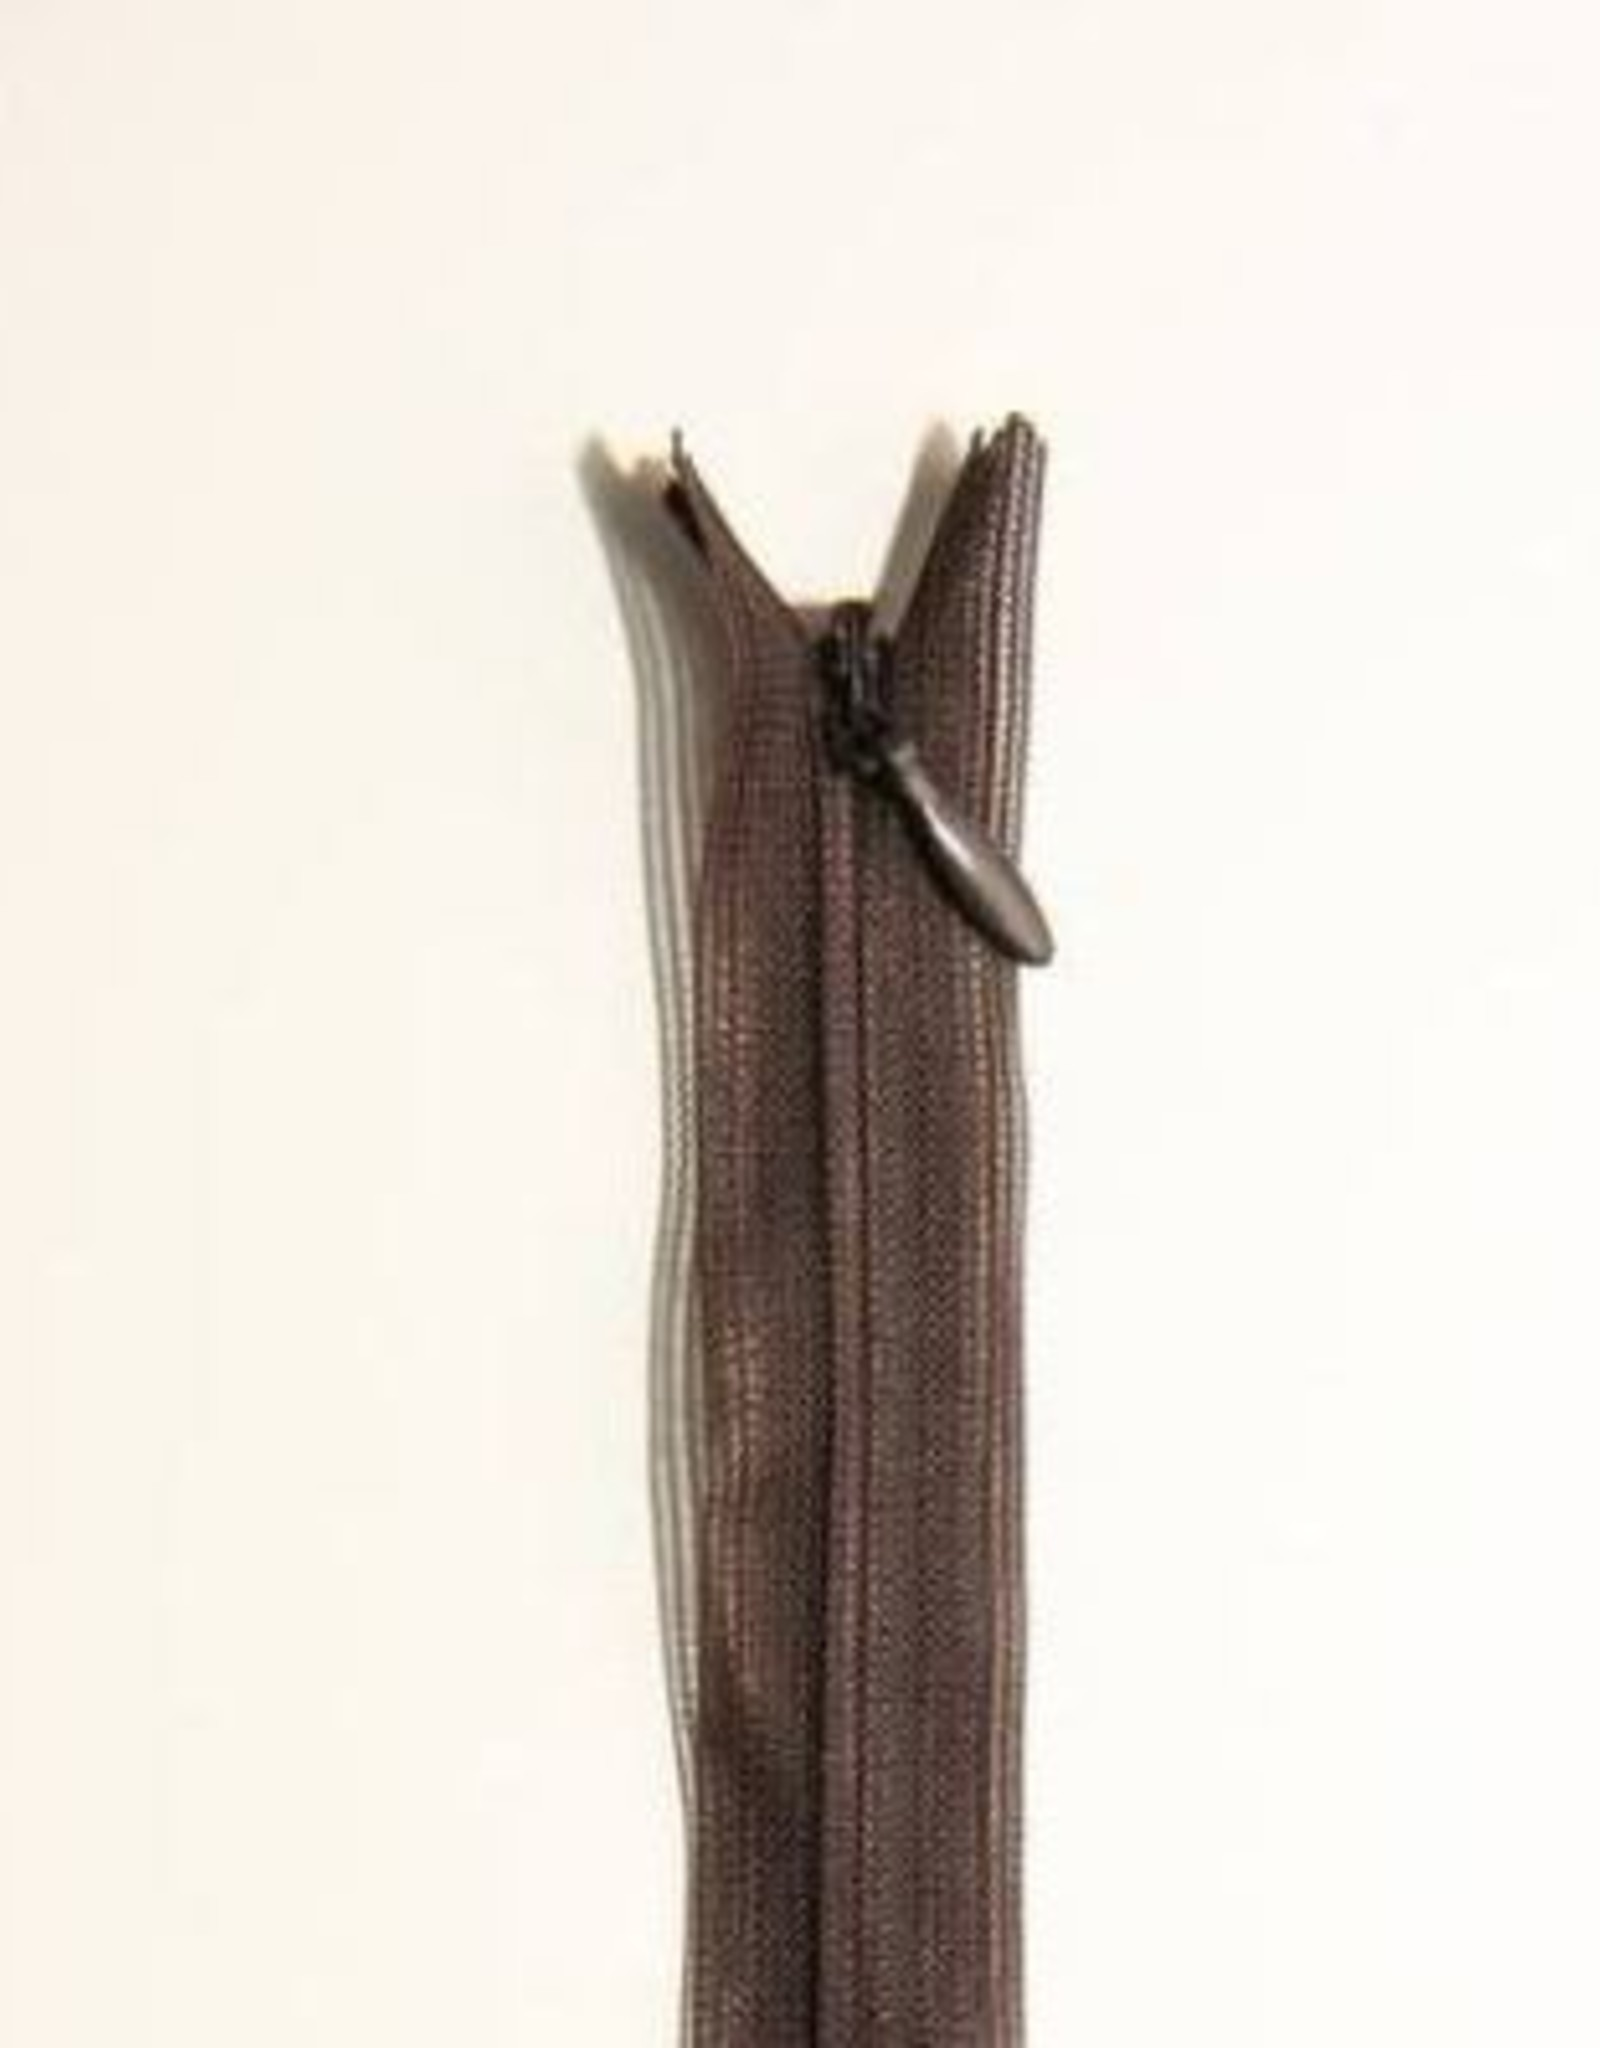 YKK NAADVERDEKTE RITS C NIET-DEELBAAR (p.1st) 916-22cm